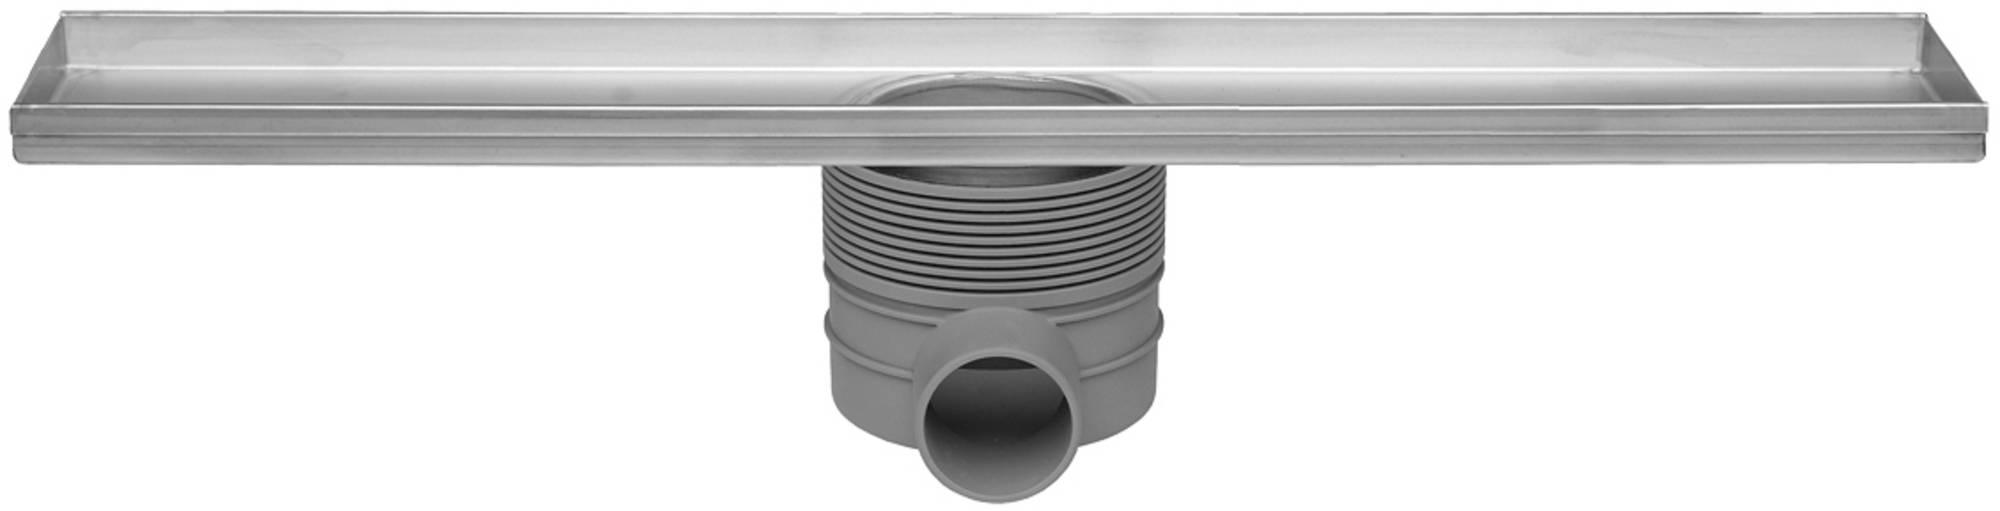 Easydrain Multi inbouwdeel drain 50 cm, zonder rooster, rvs